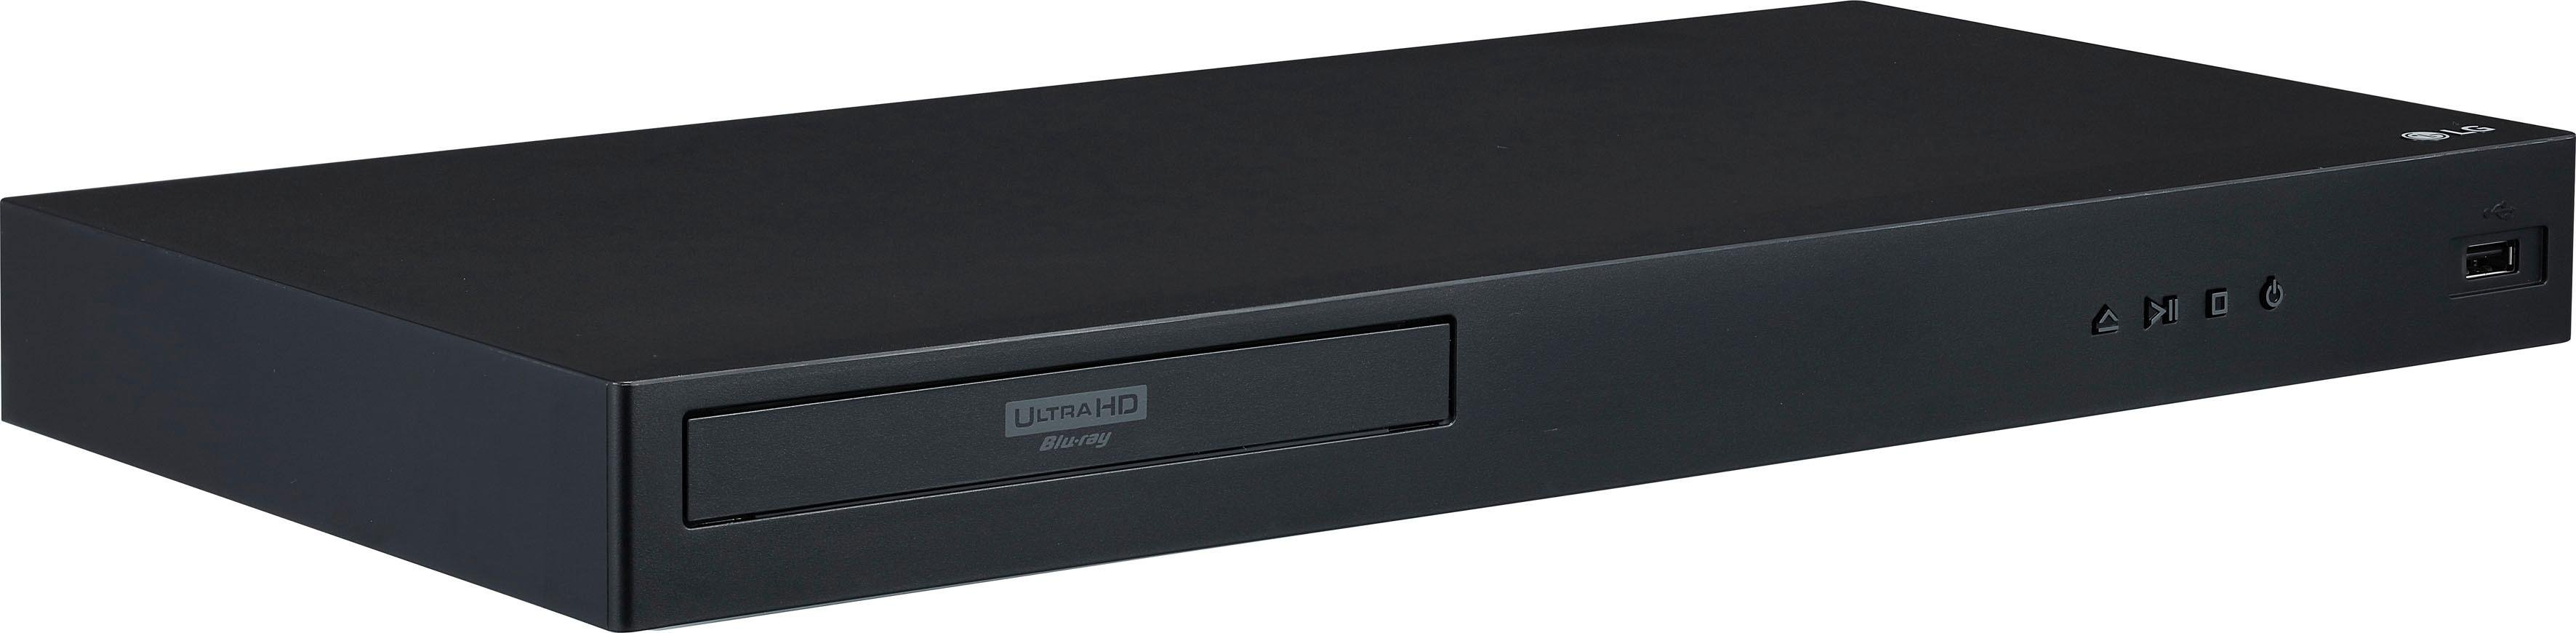 LG »UBK80« blu-rayspeler (4k Ultra HD, LAN (ethernet) wifi, 4K-upscalingtechniek) nu online bestellen